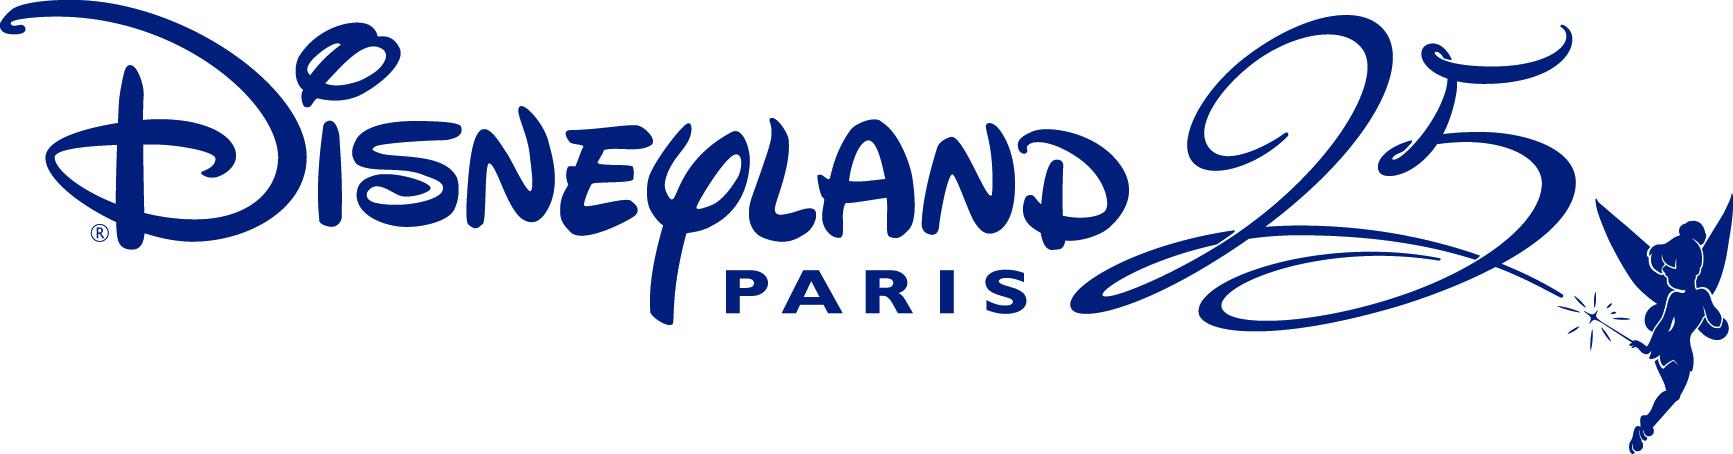 Disneyland Paris 25 Ans De Chiffres Disneyland Paris